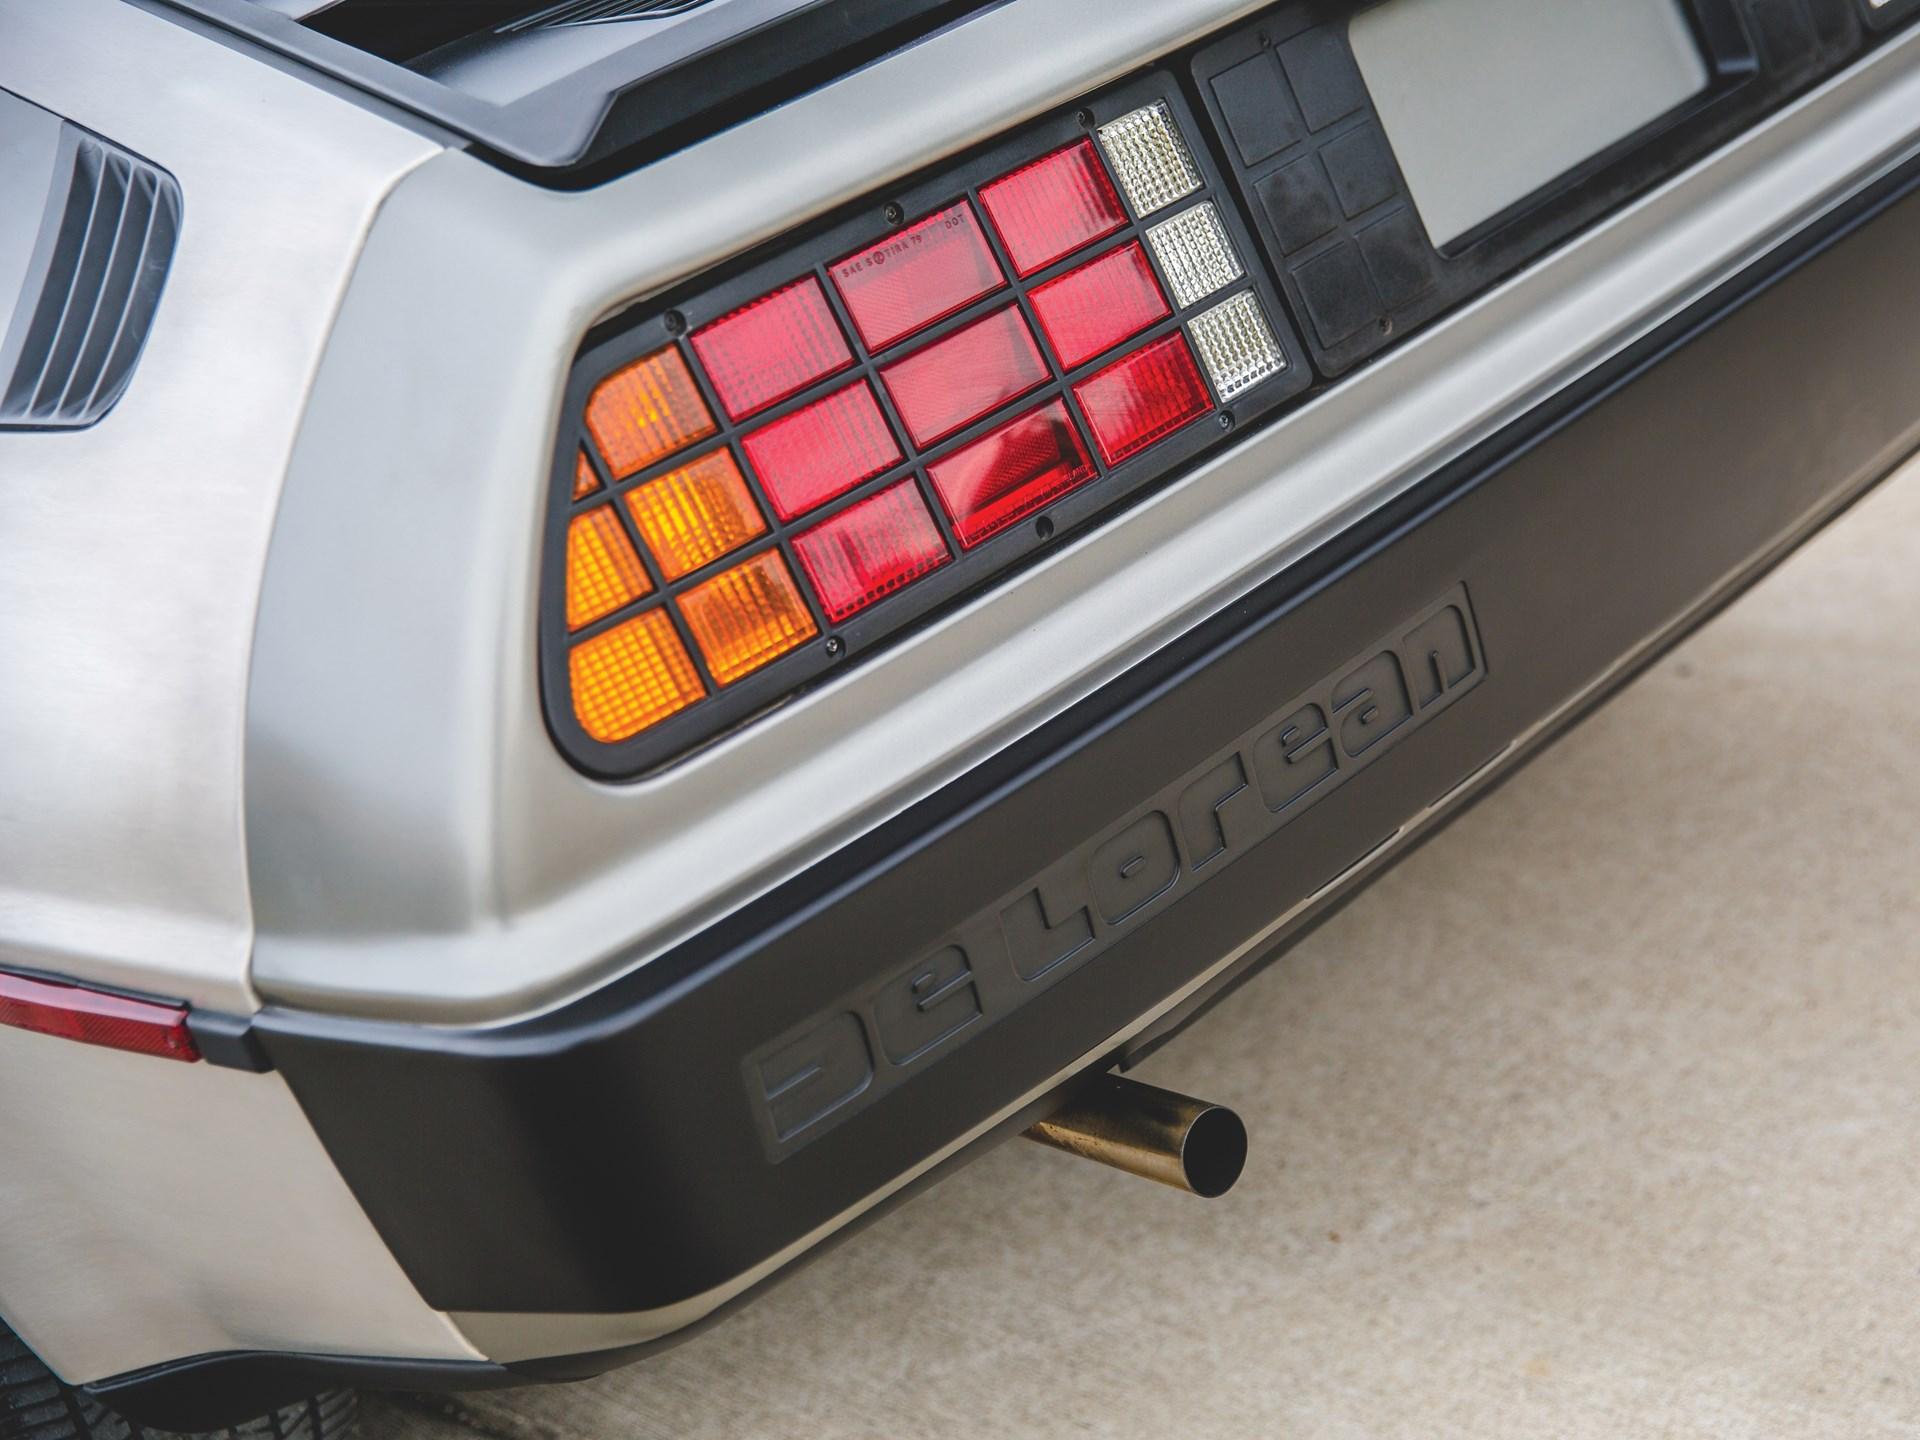 1981 DeLorean DMC-12 rear bumper detail